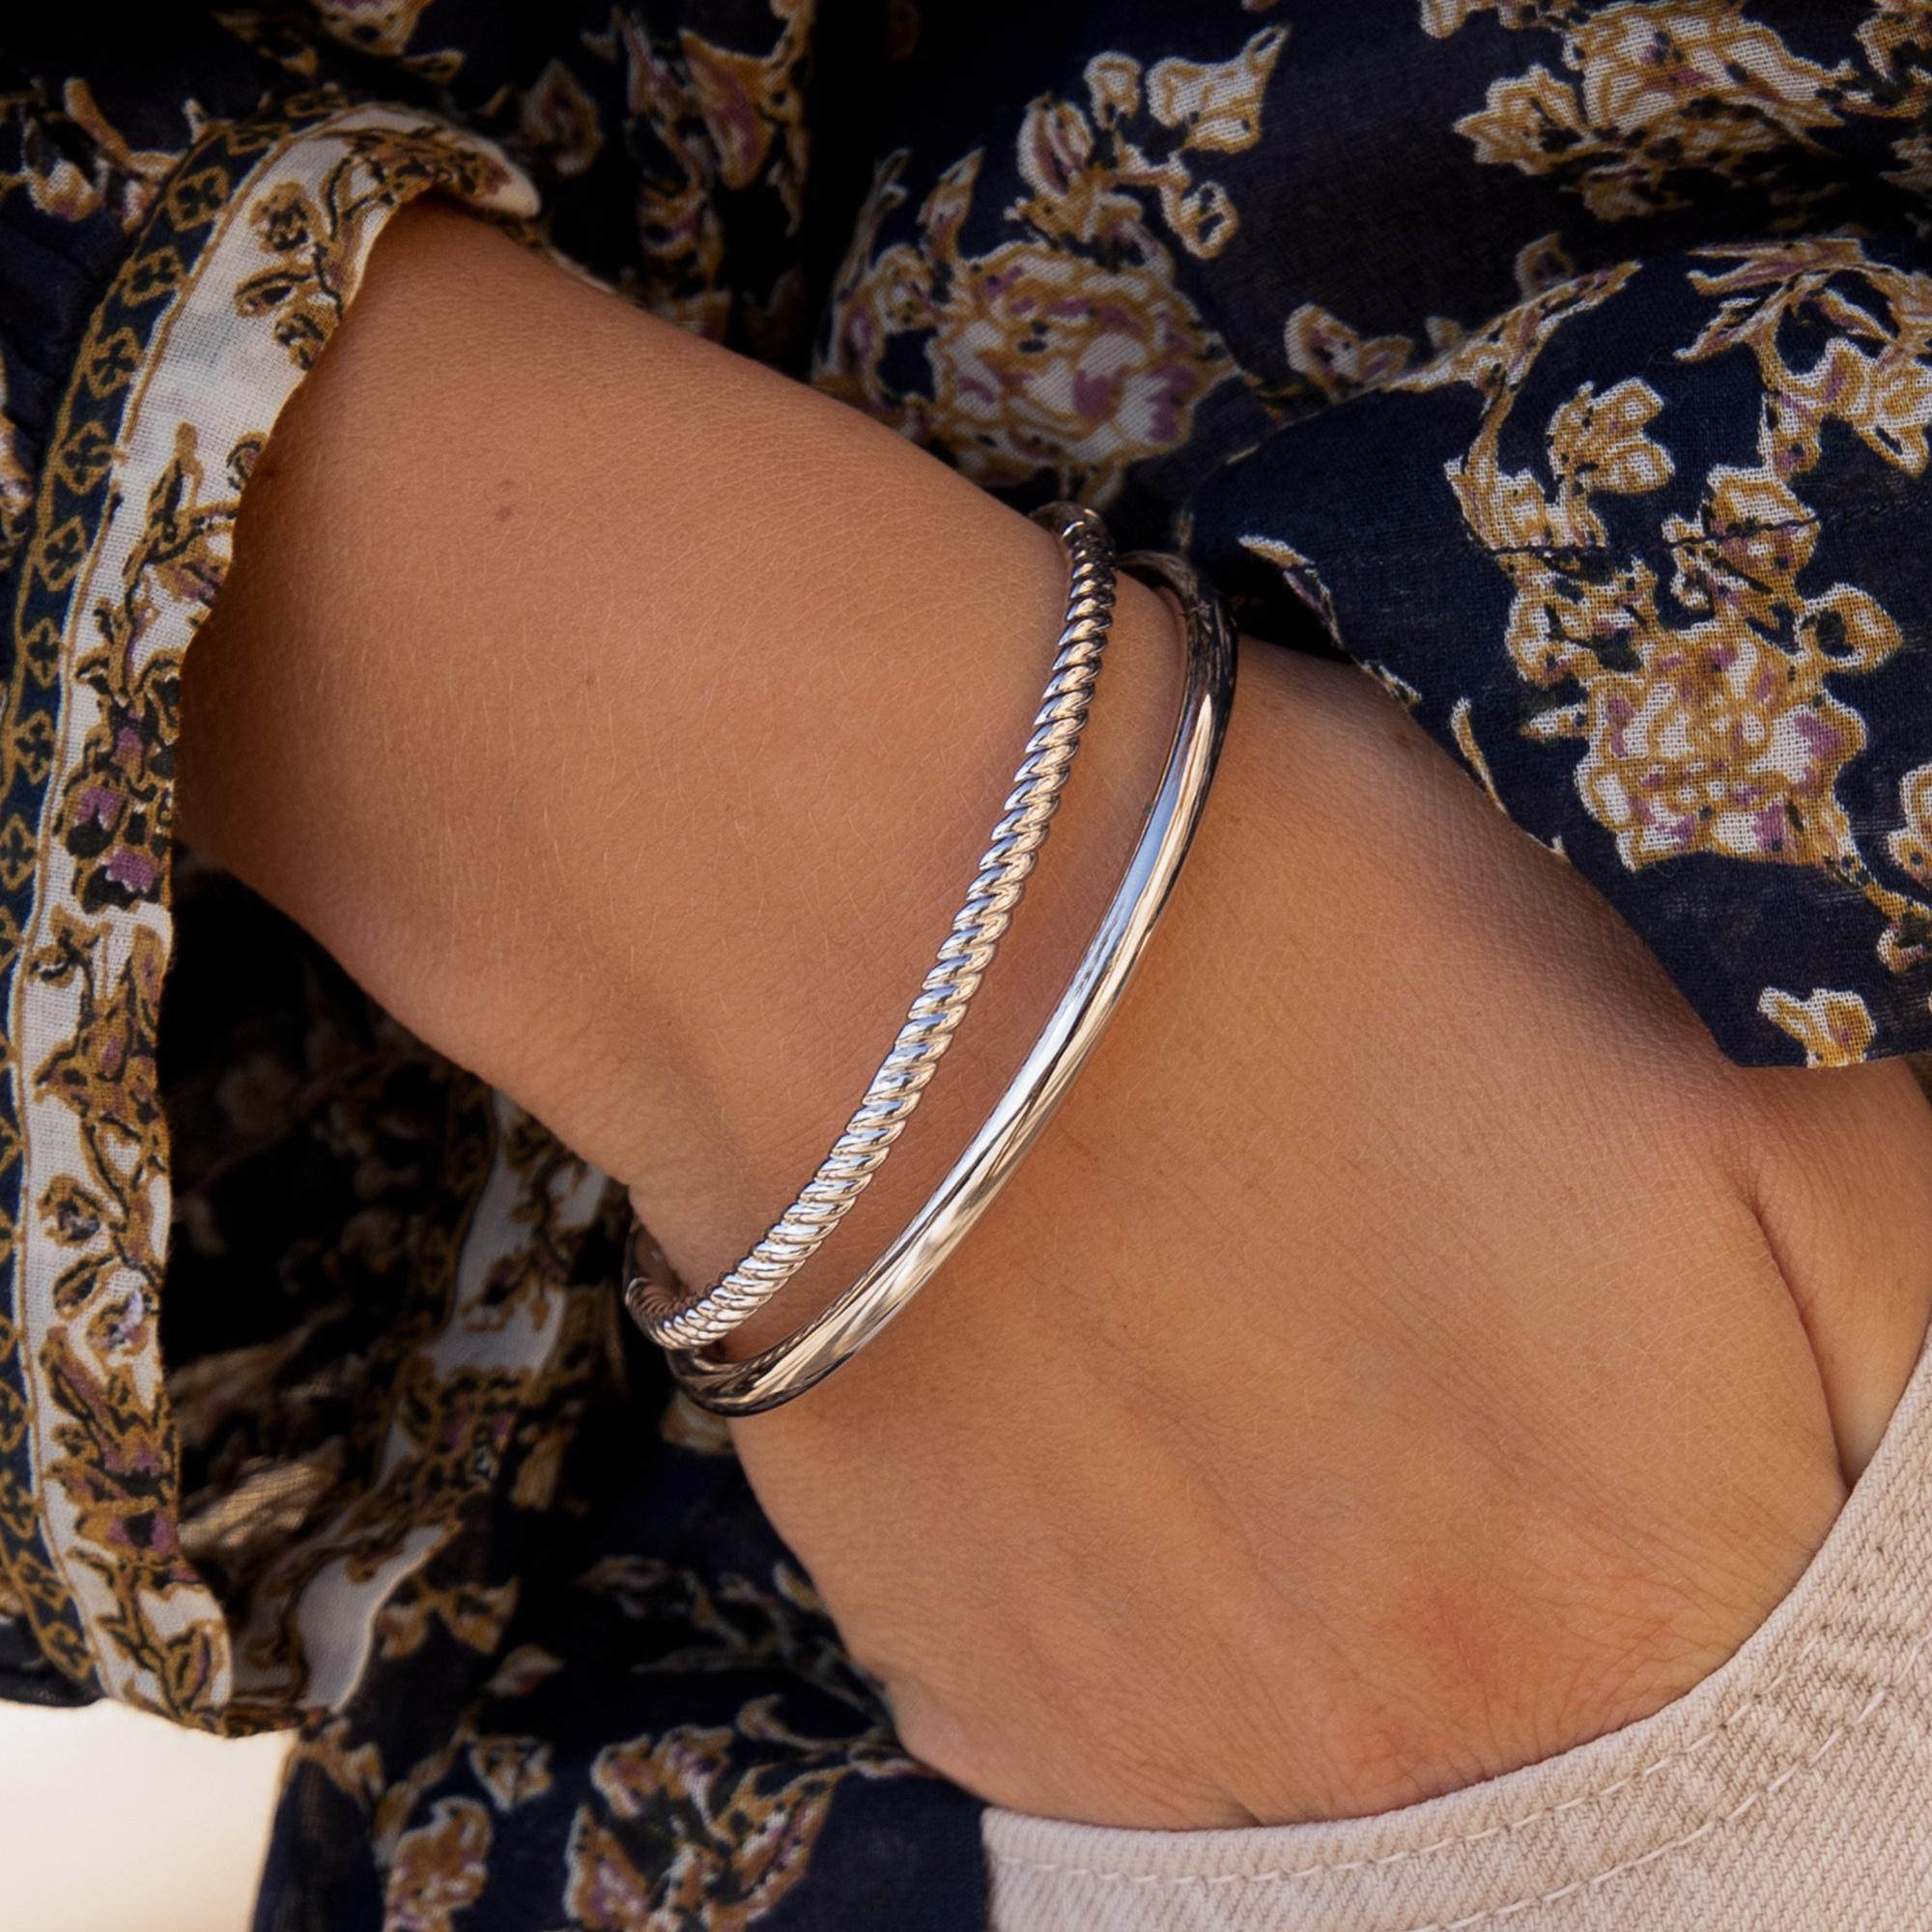 Parte di Me Bibbiena Poppi Casentino bracciale rigidi in argento sterling 925